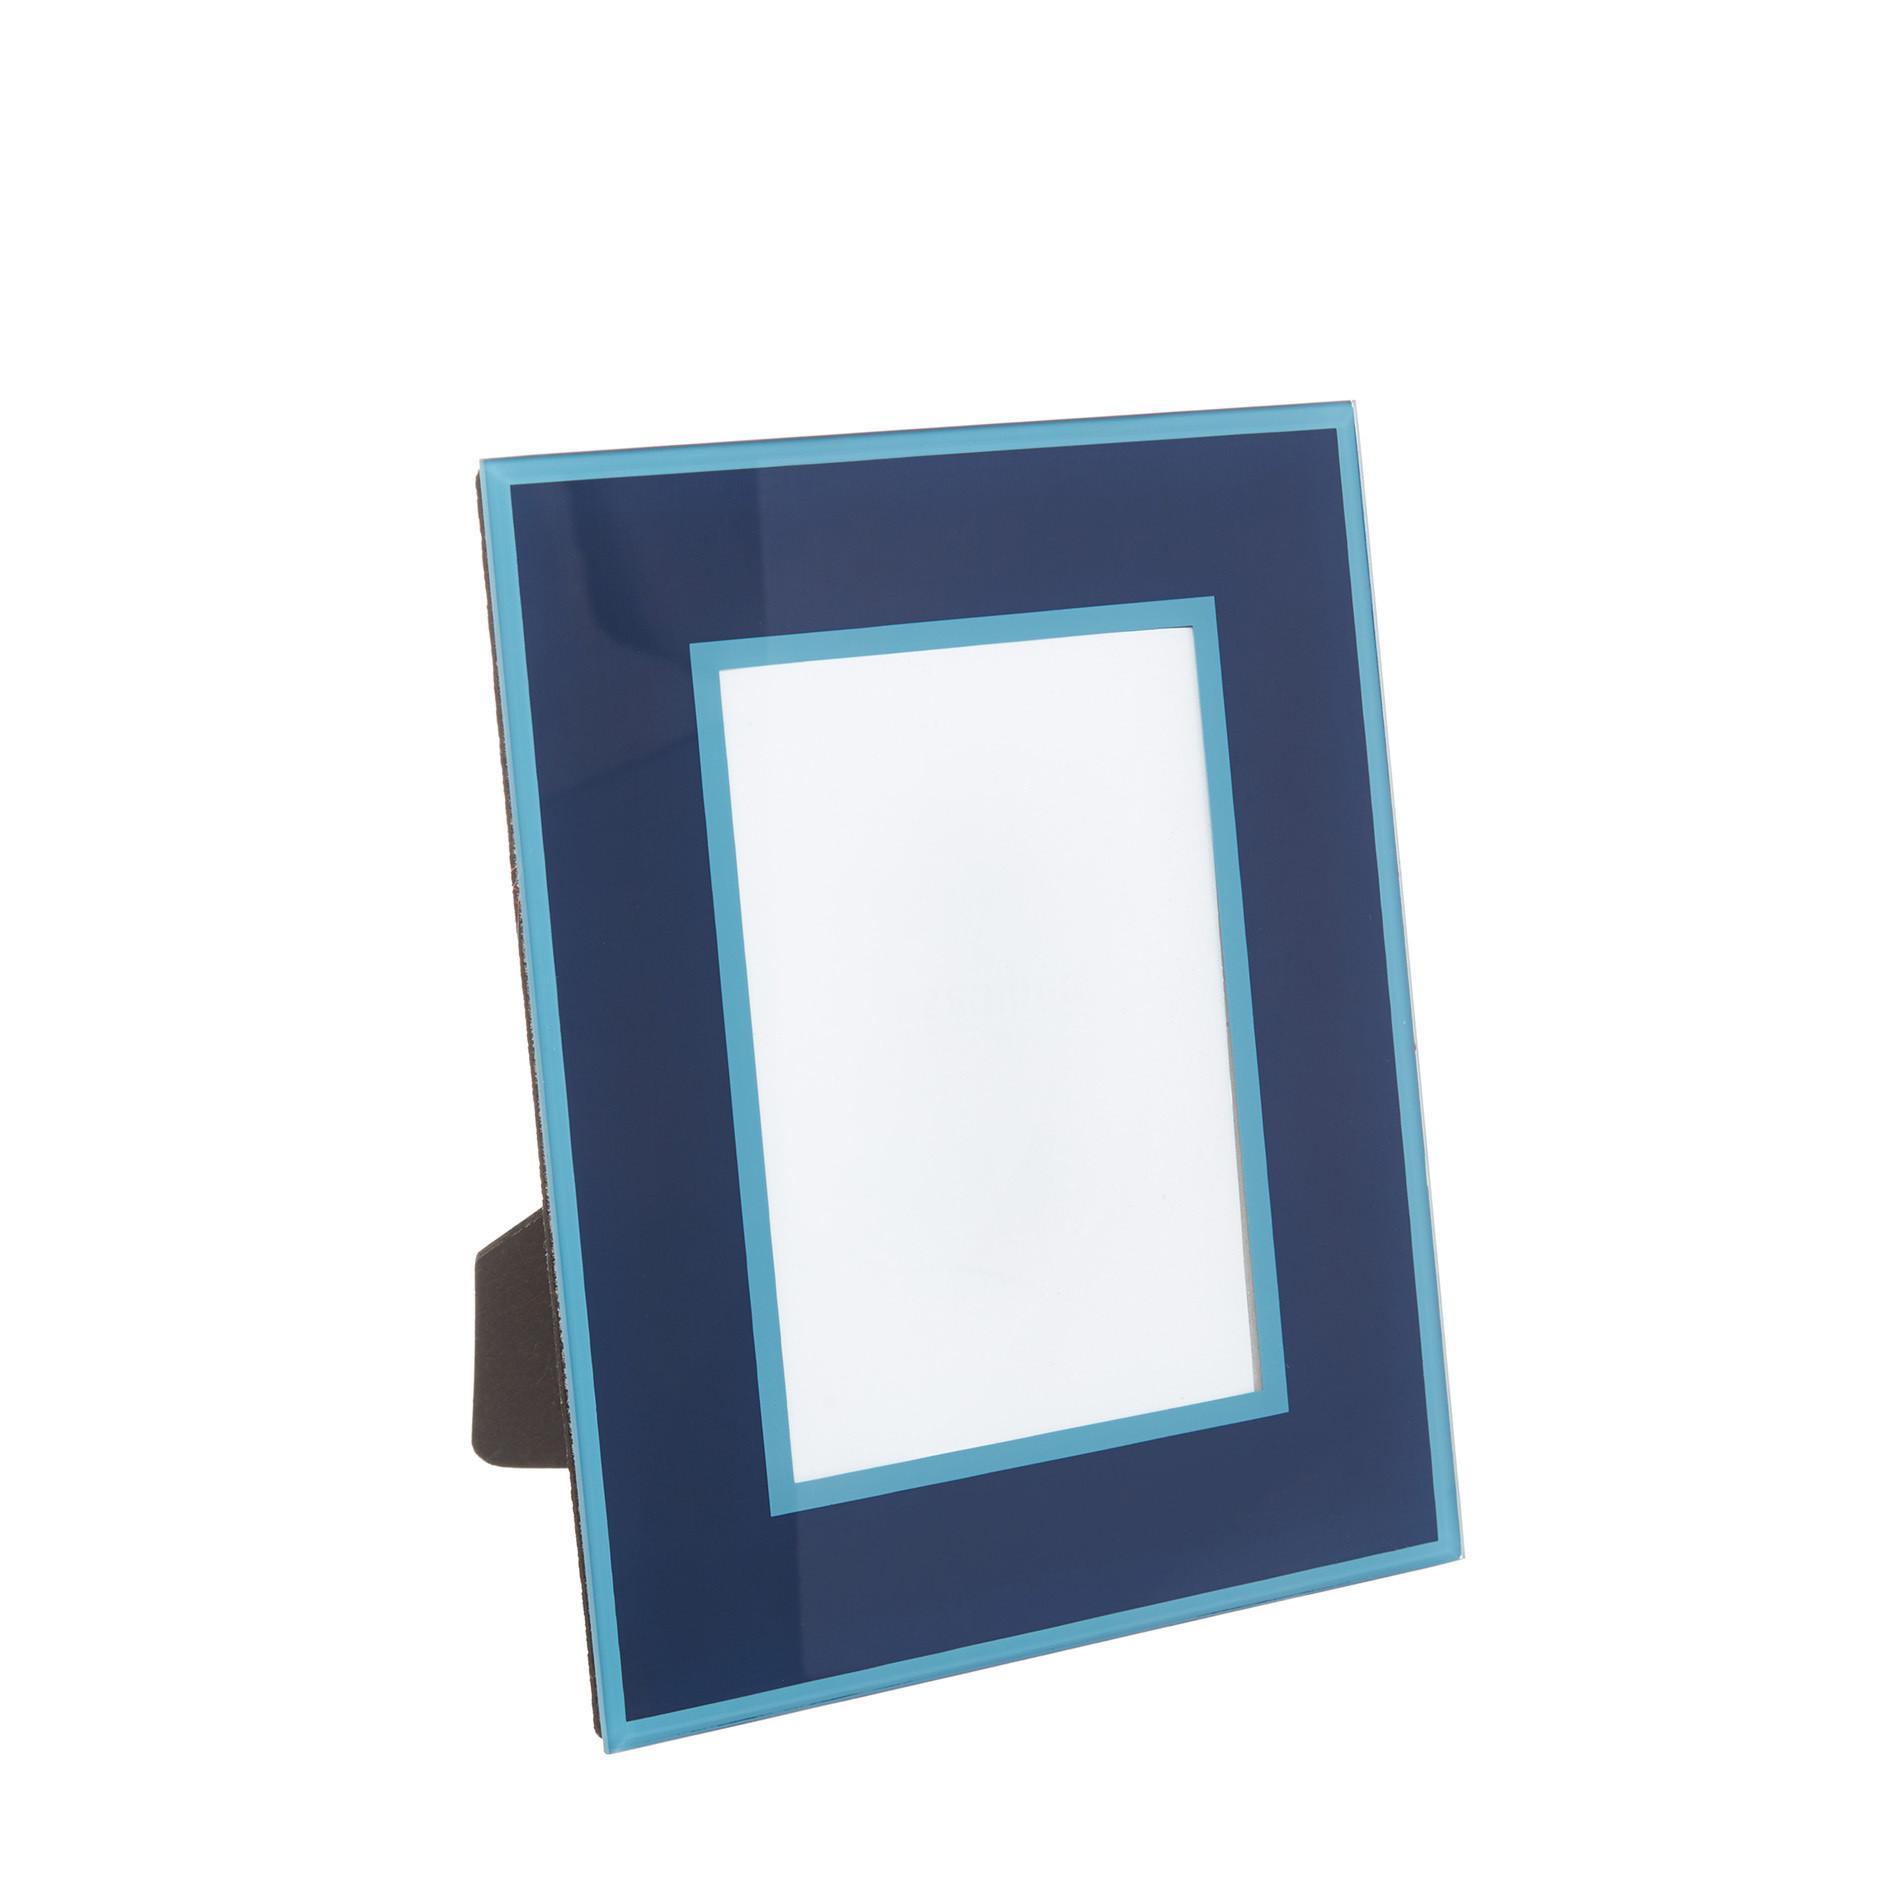 Portafoto cornice vetro colorato, Blu, large image number 0